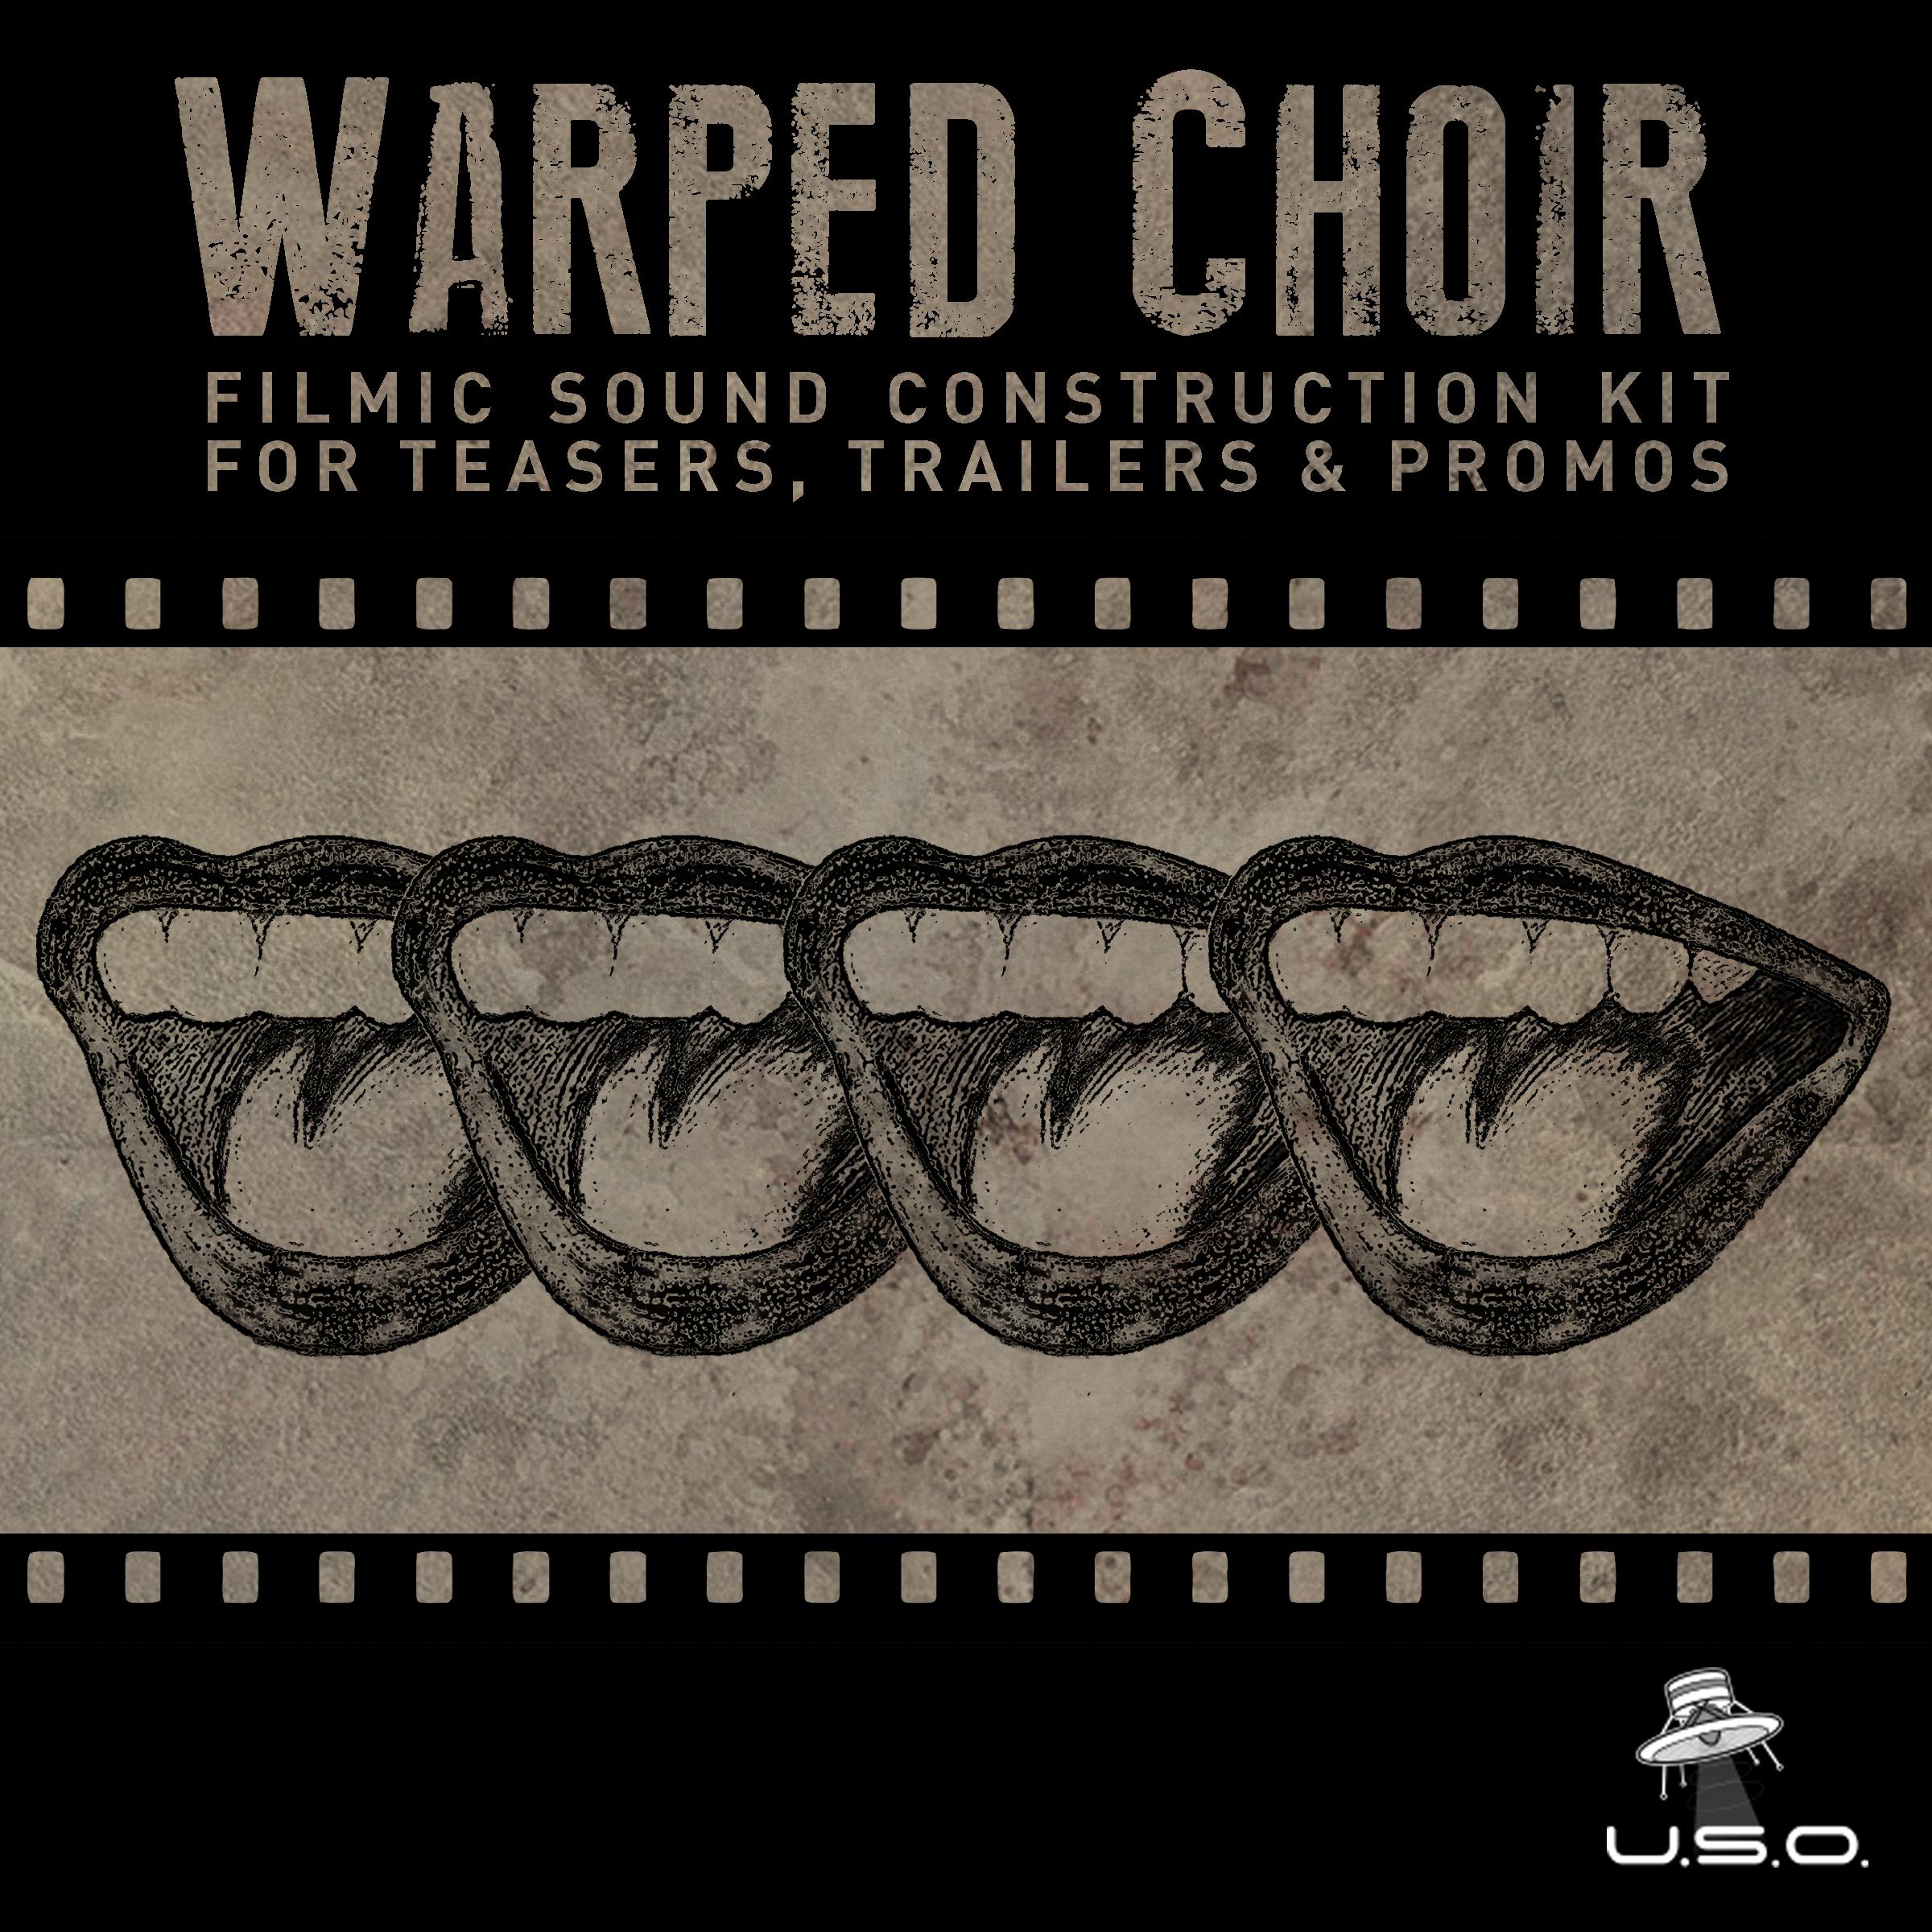 Warped Choir - a filmic sound construction kit